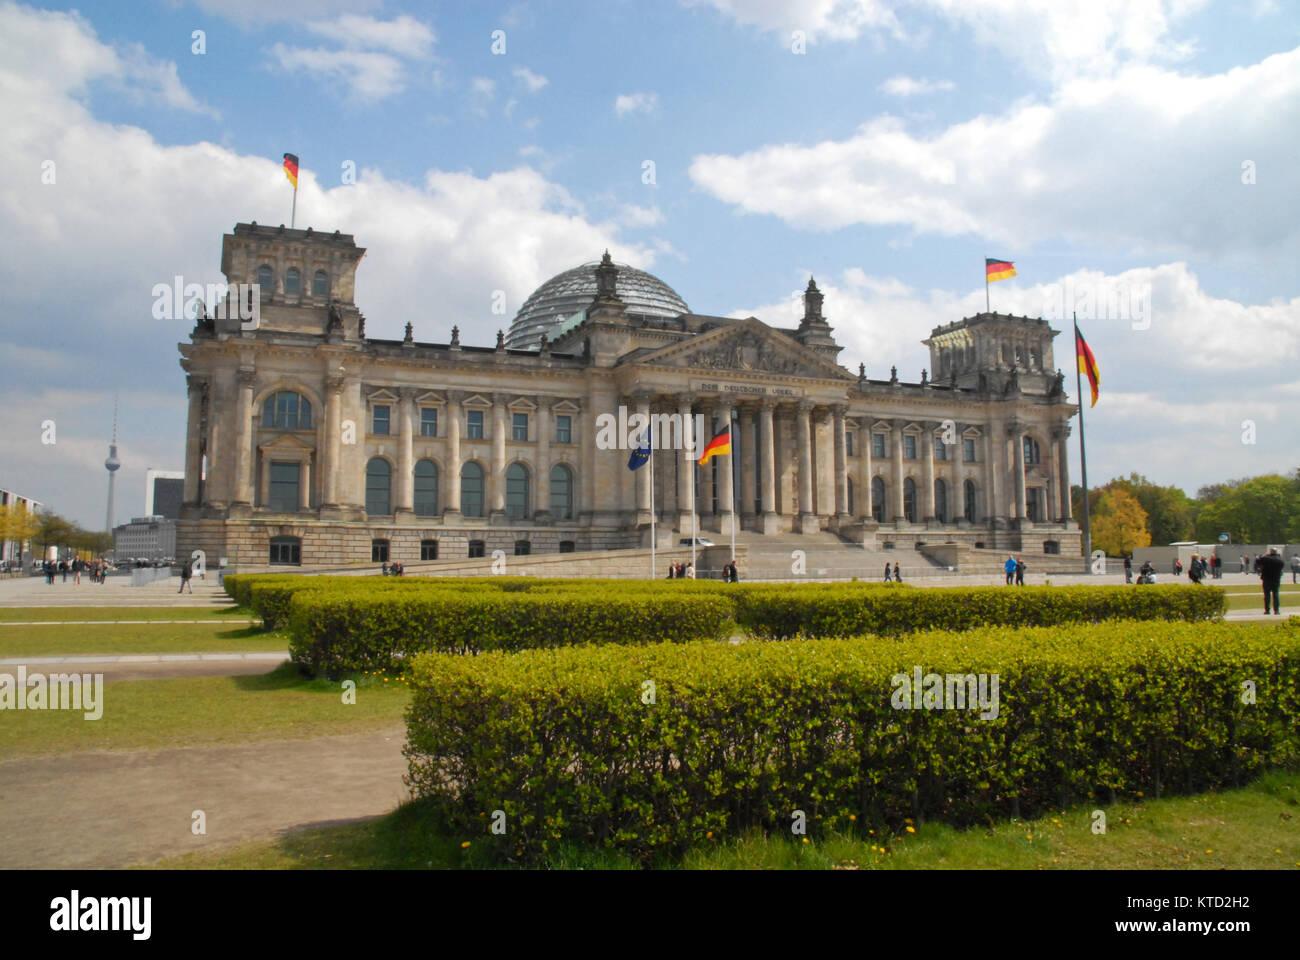 Berlin, Germany - May 1, 2017: German Parliament (Bundestag) in spring - Stock Image